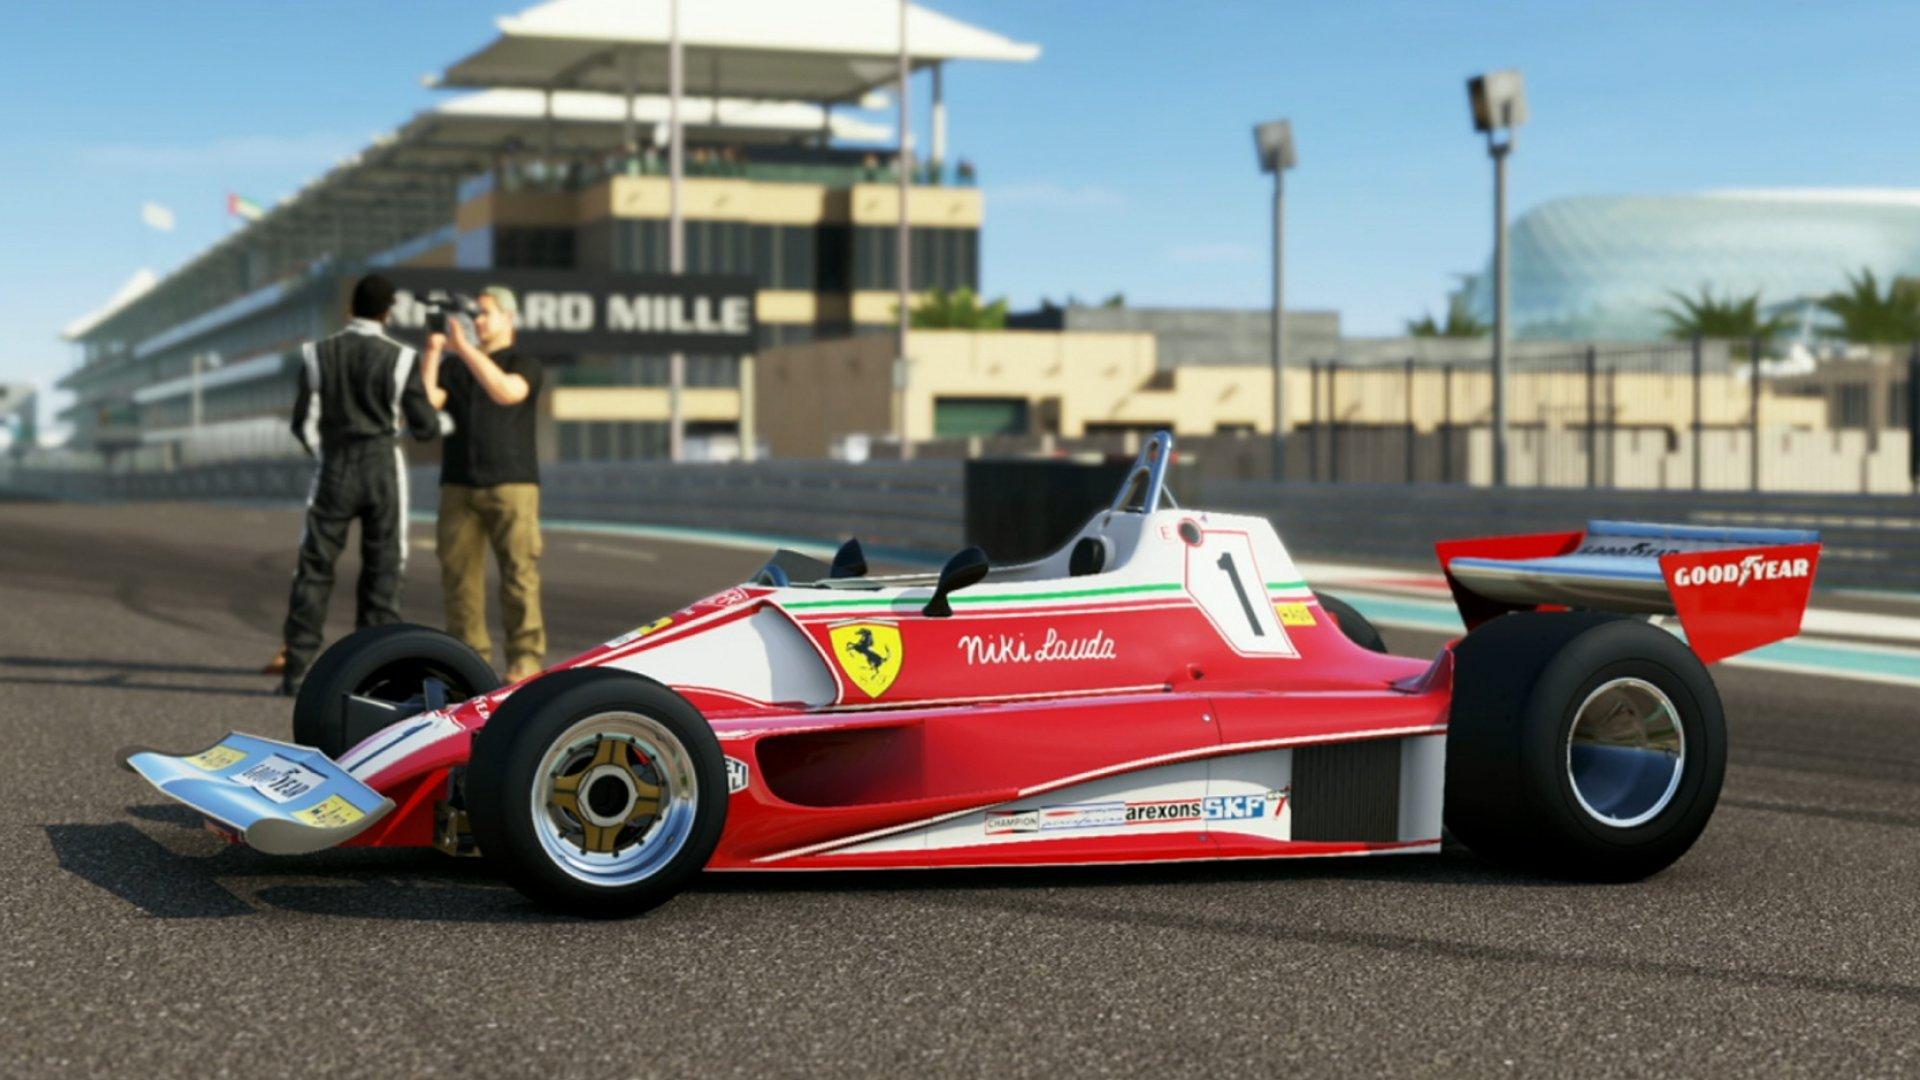 Forza 5 Ferrari 312 Yas Marina Thrustmaster TX Wheel